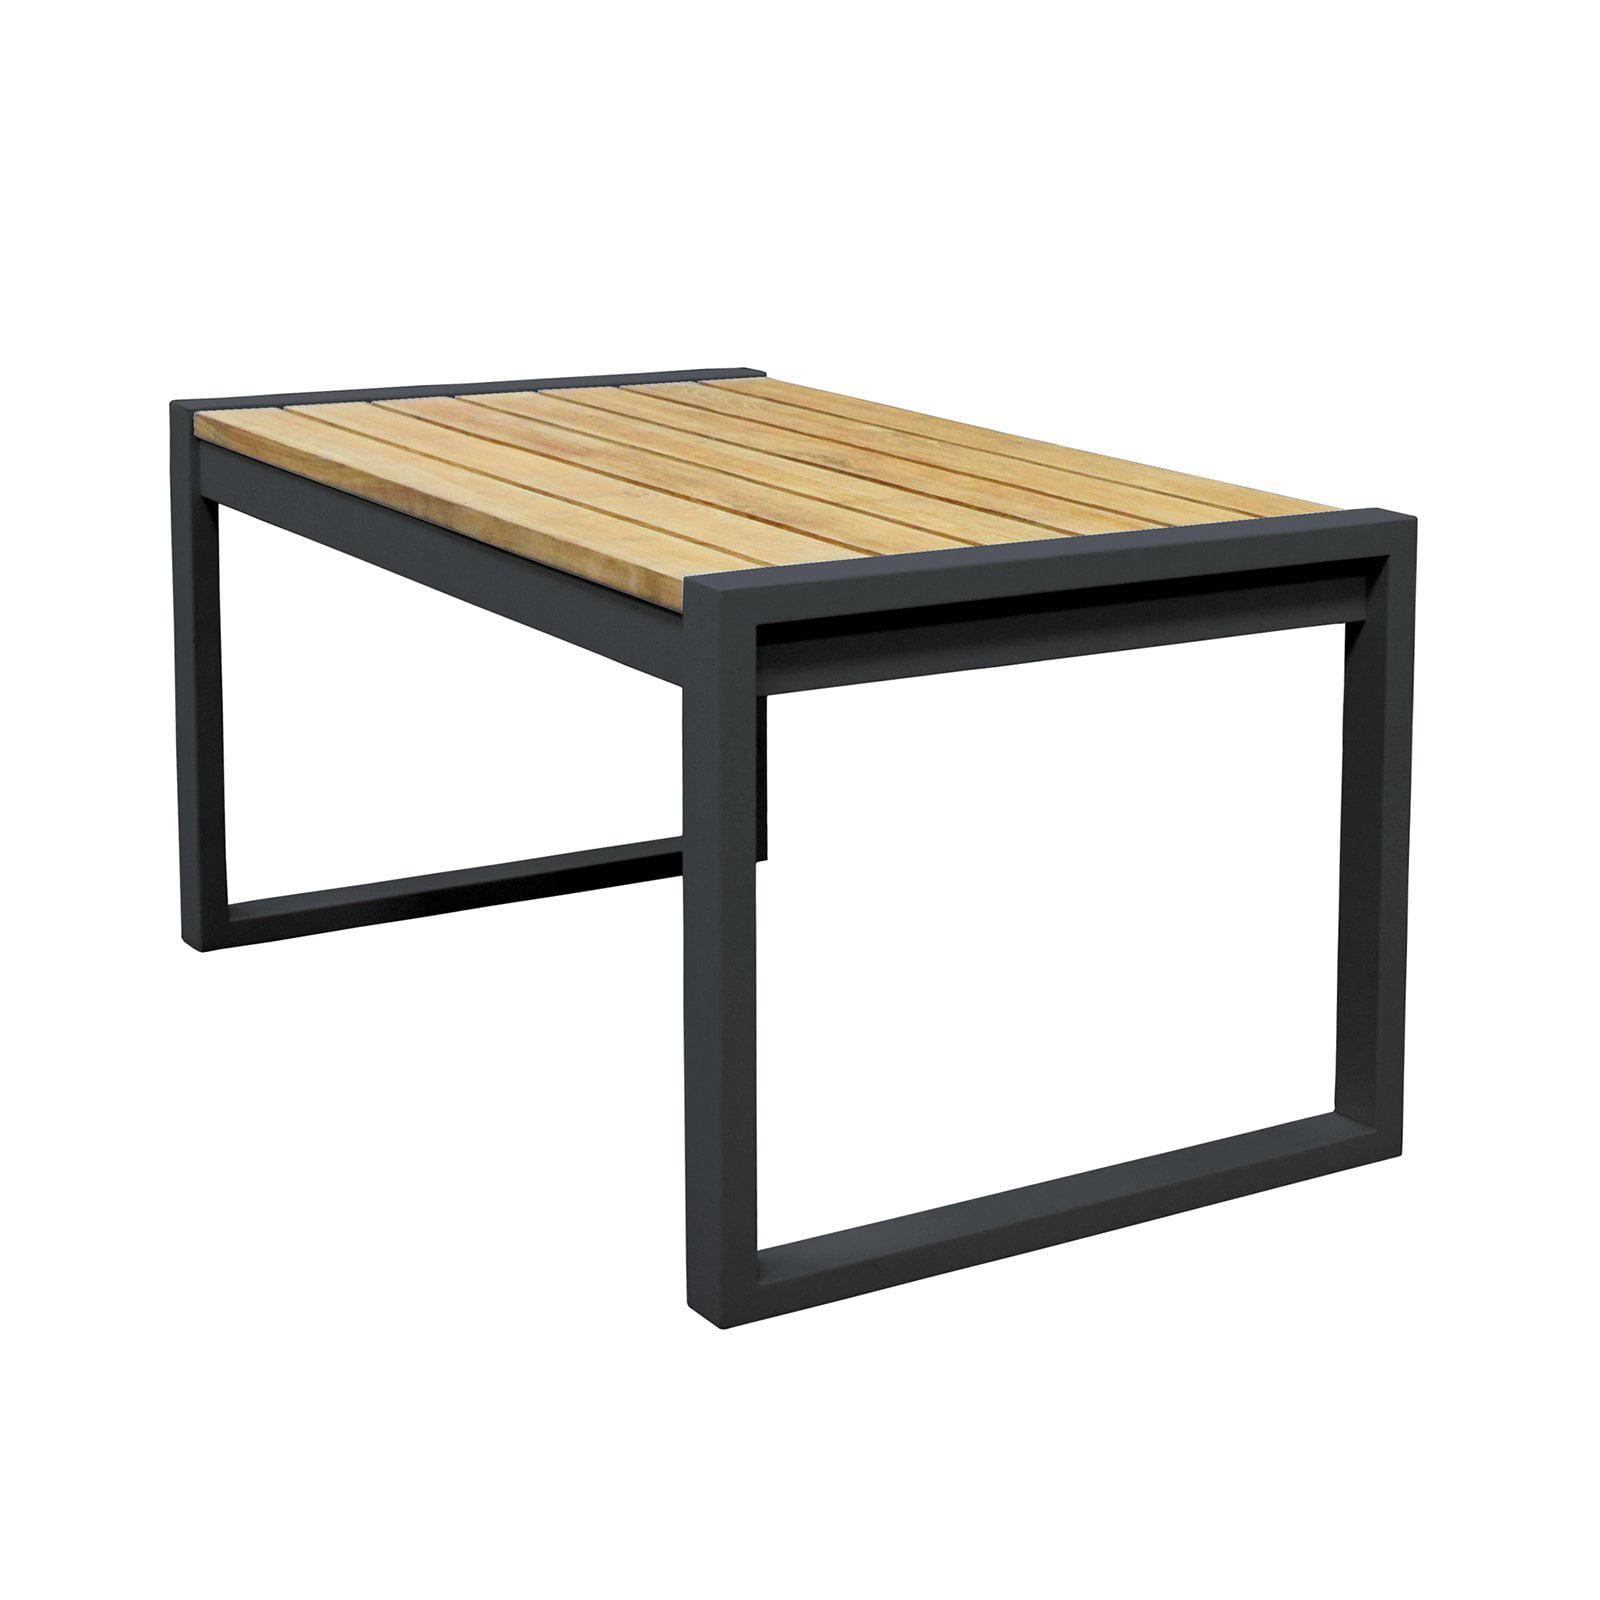 Asta Home Furnishings California Room Classic Style Teak Iron Patio Coffee Table by Asta